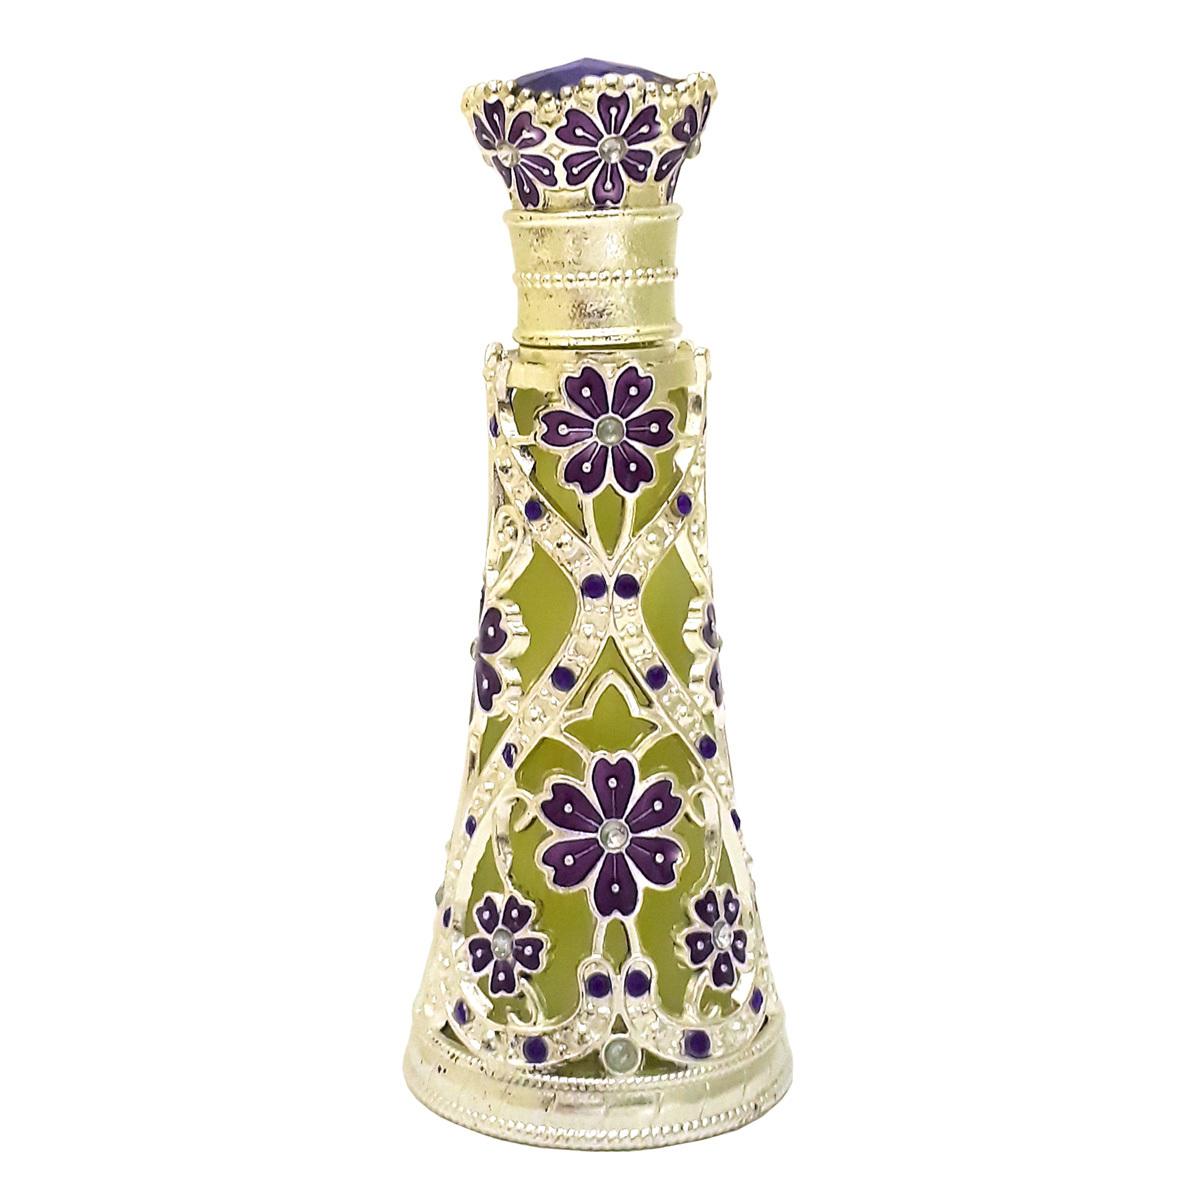 Zekrayat al Ishq / Зекрайат аль Ишк 20 мл арабские масляные духи от Халис Khalis Perfumes